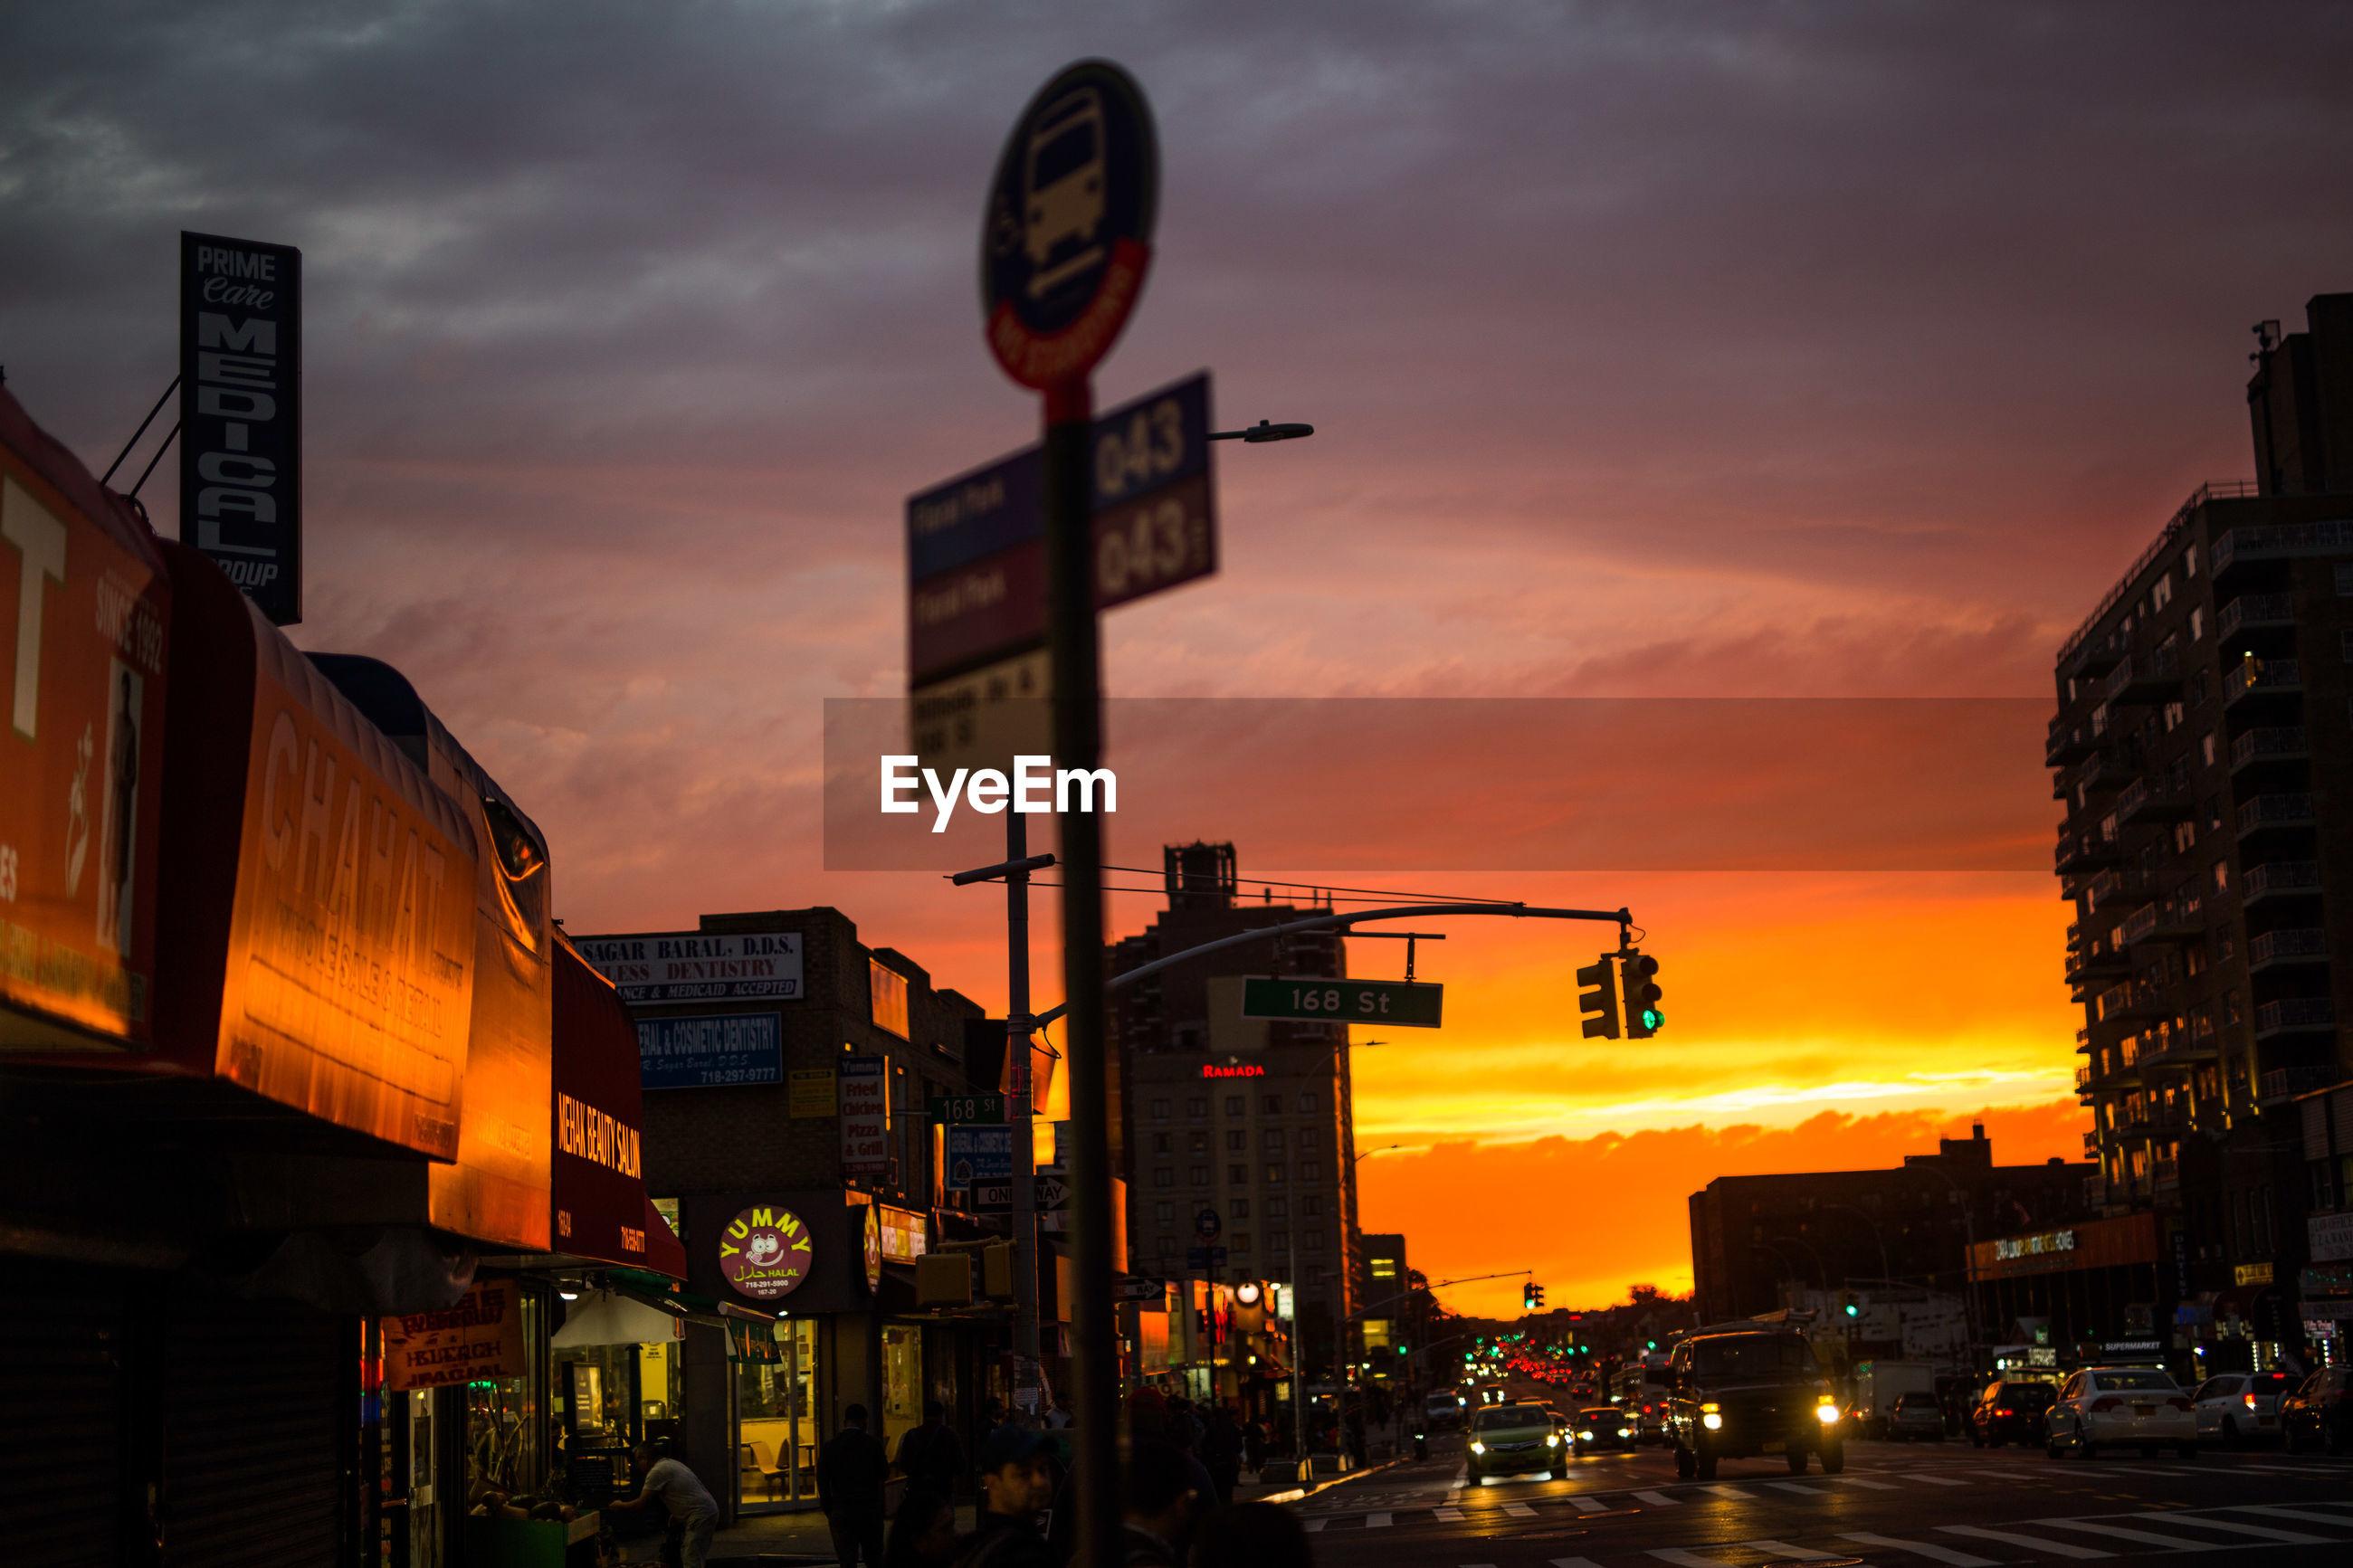 VIEW OF CITY STREET AGAINST ORANGE SKY